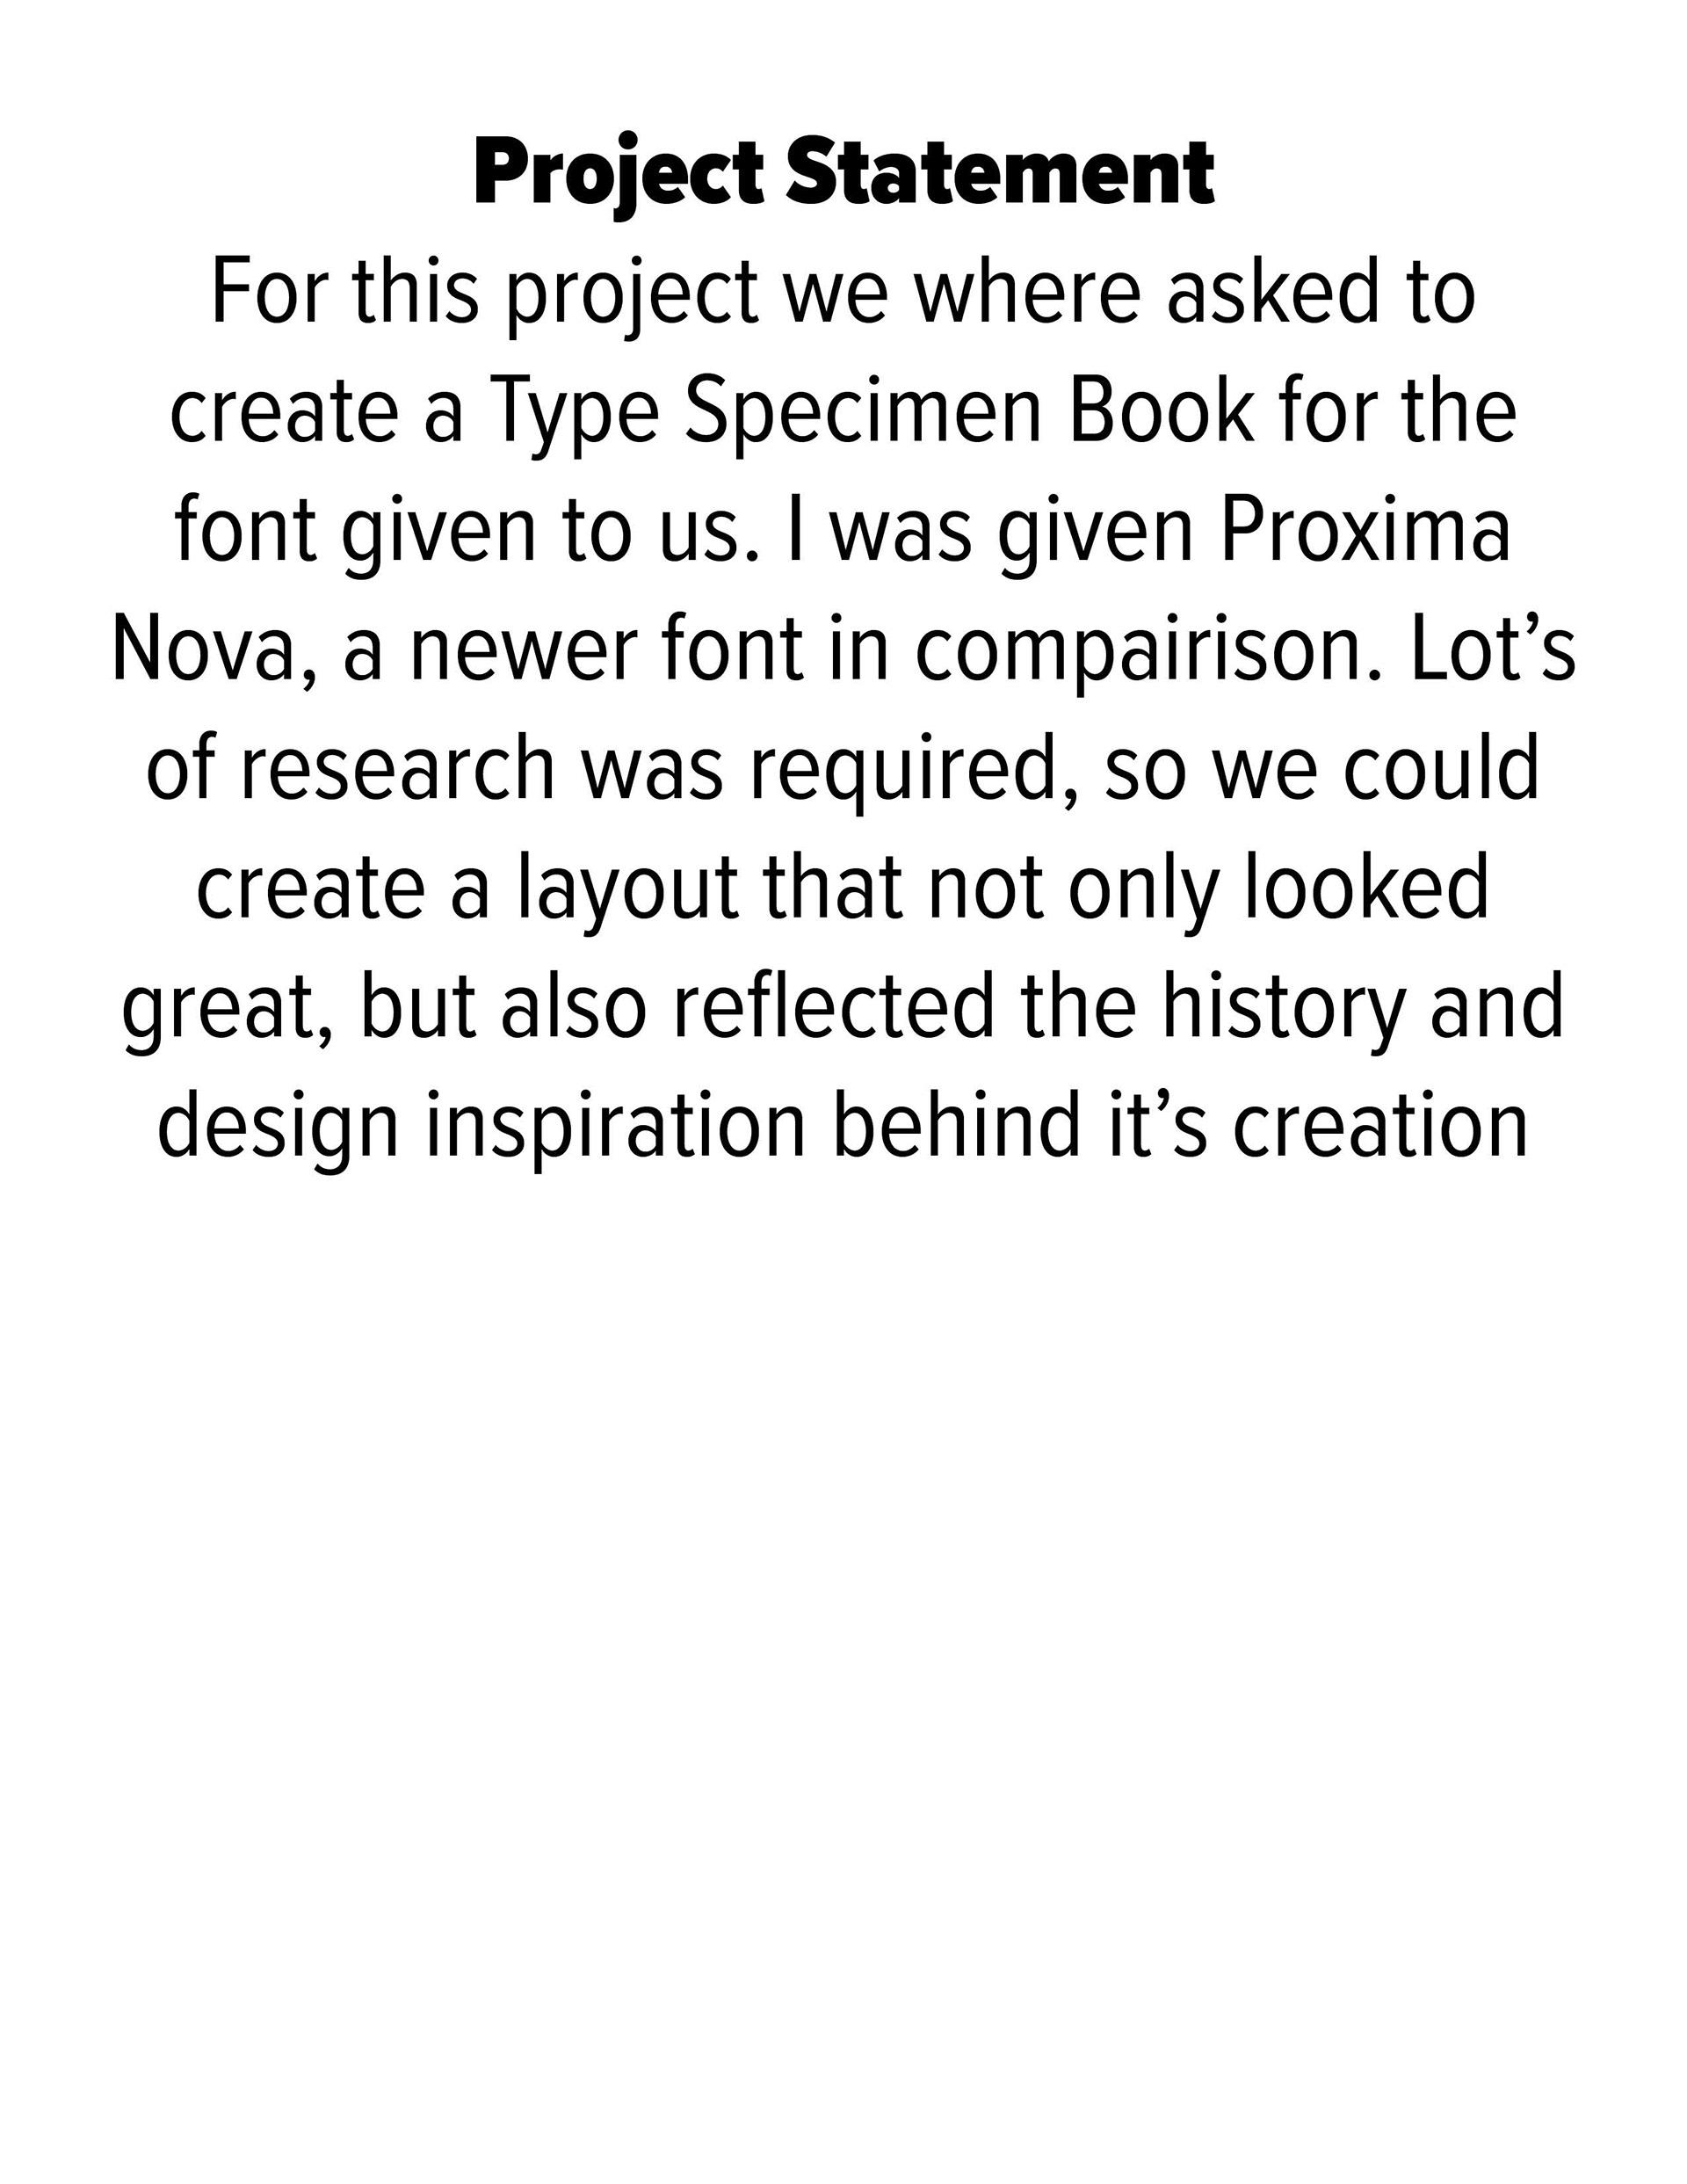 Proxima Nova App on Behance